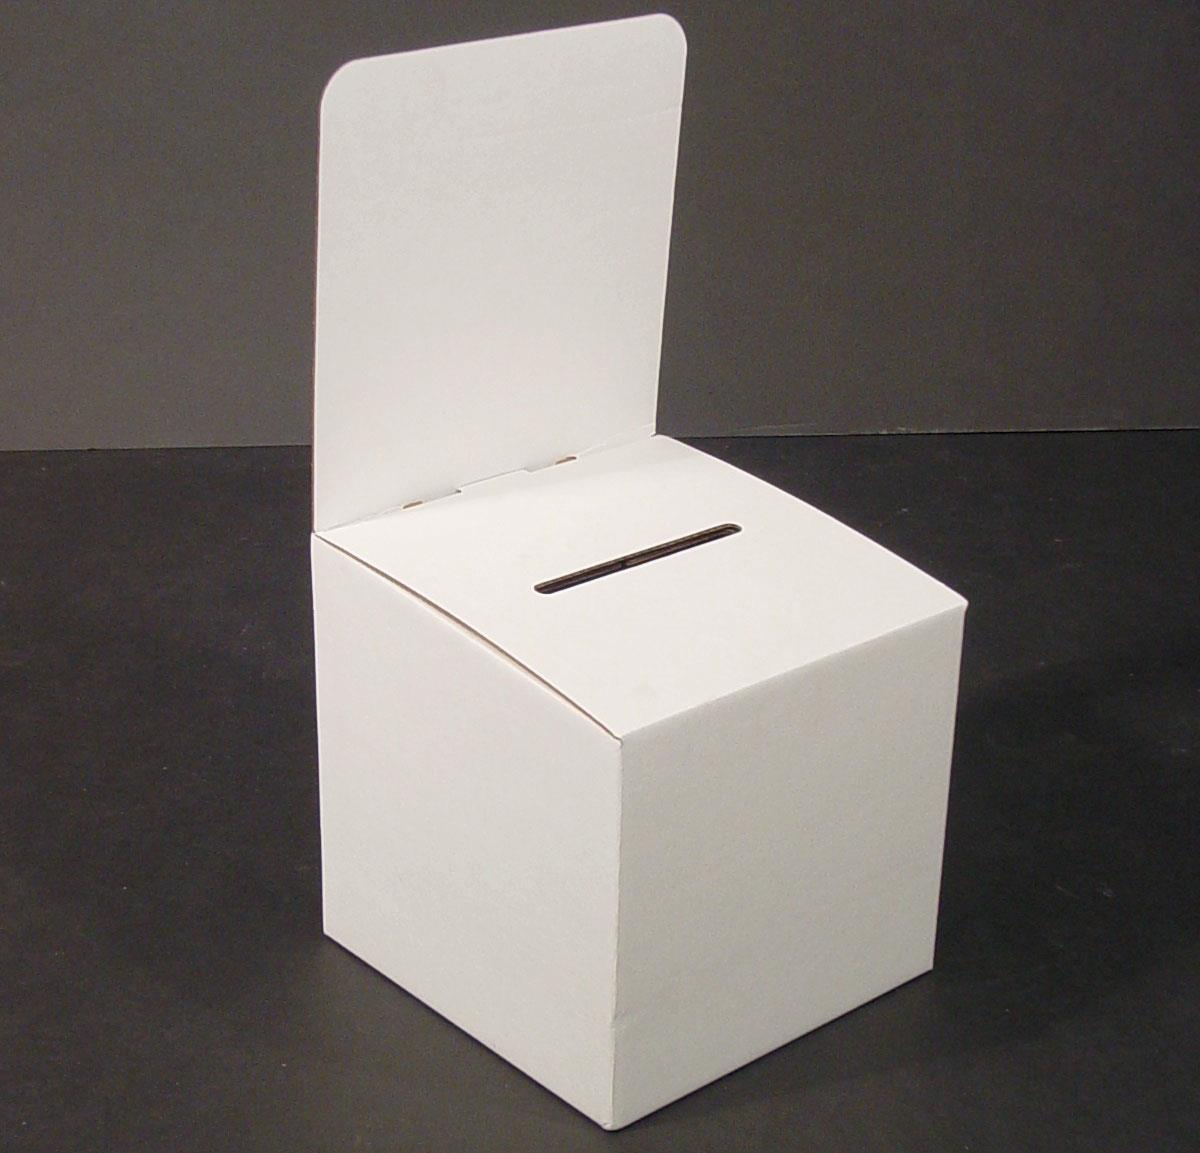 Displays2go Cardboard Ballot Box with Header - White